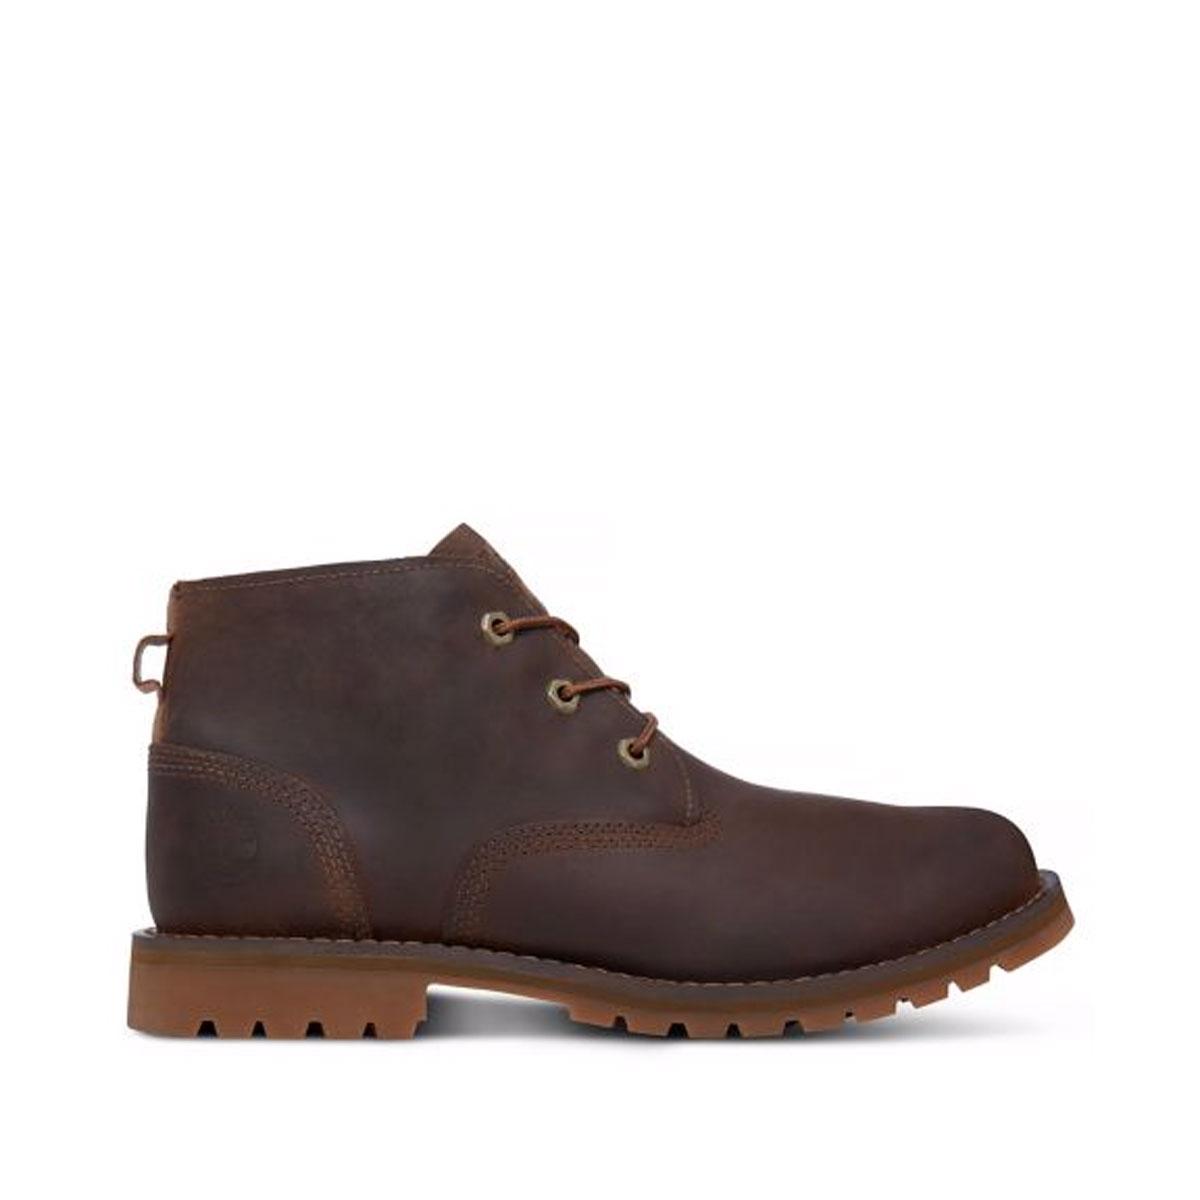 ... Image of Timberland Earthkeepers Larchmont WP Chukka Boots (Men\u0027s) -  Gaucho Saddleback (Dark ...